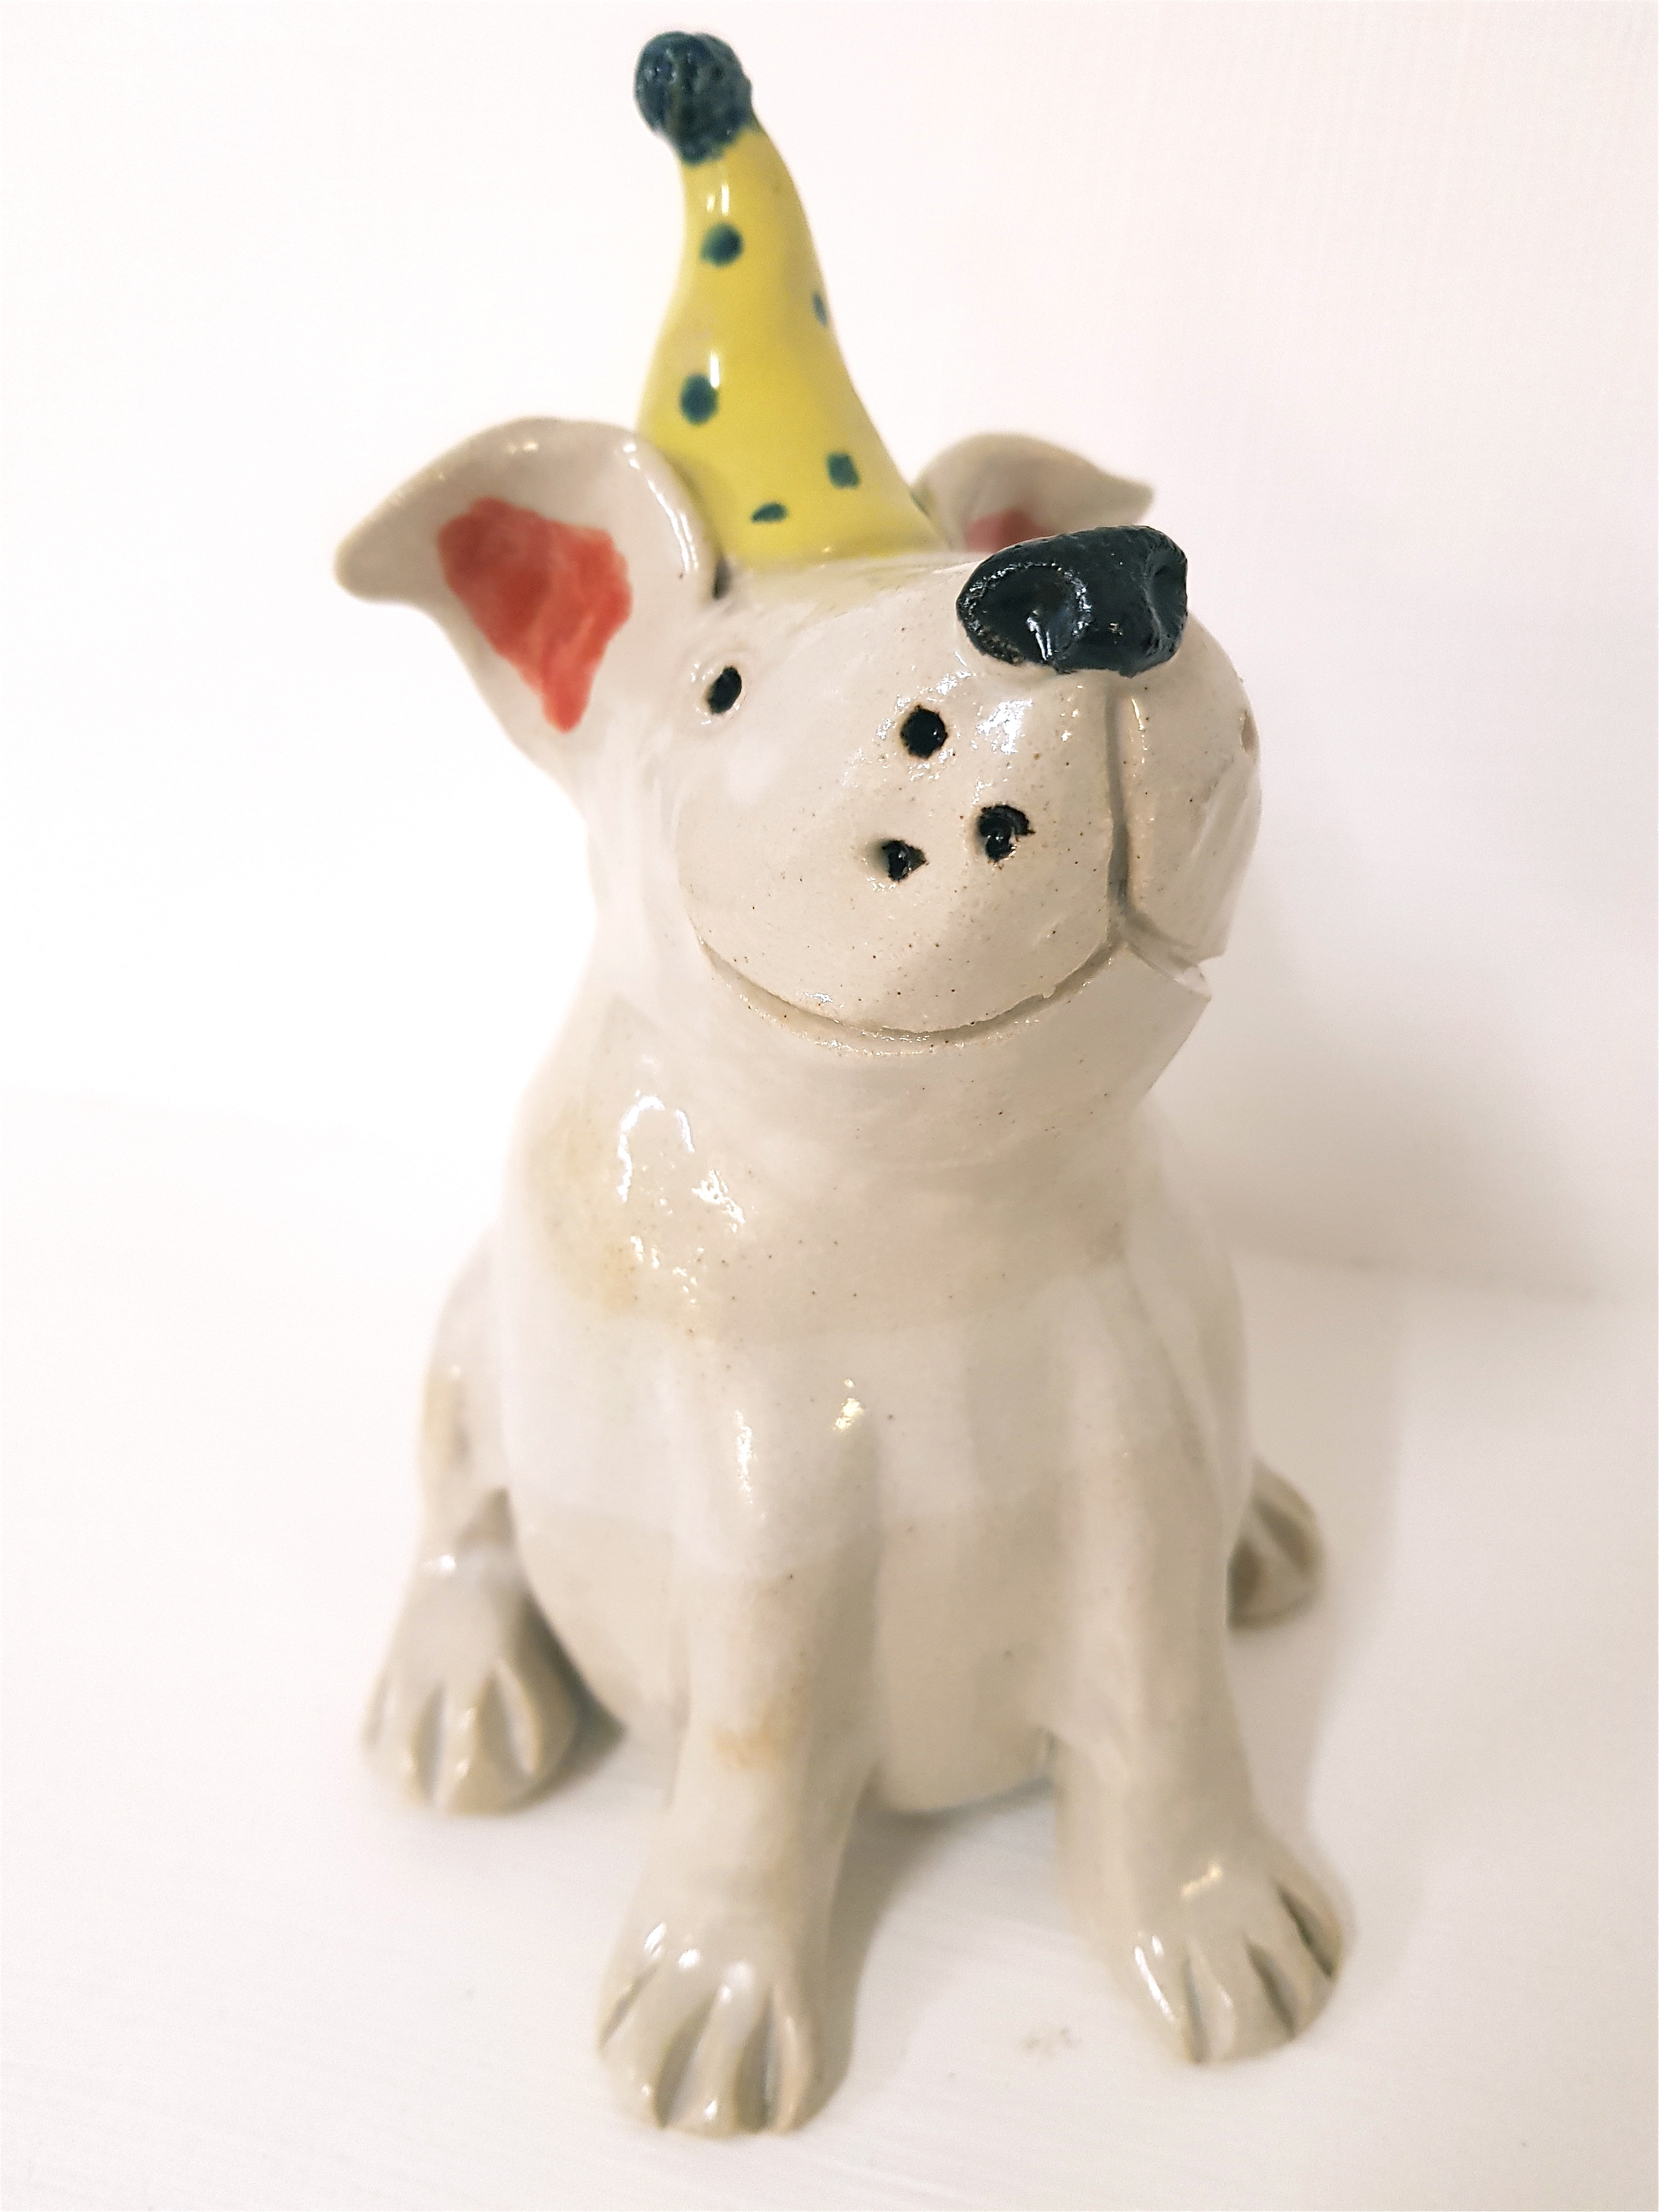 Keramikhund mit Zipfelmütze, Unikat, handmodelliert, handbemalt, Töpferei, La ceramica